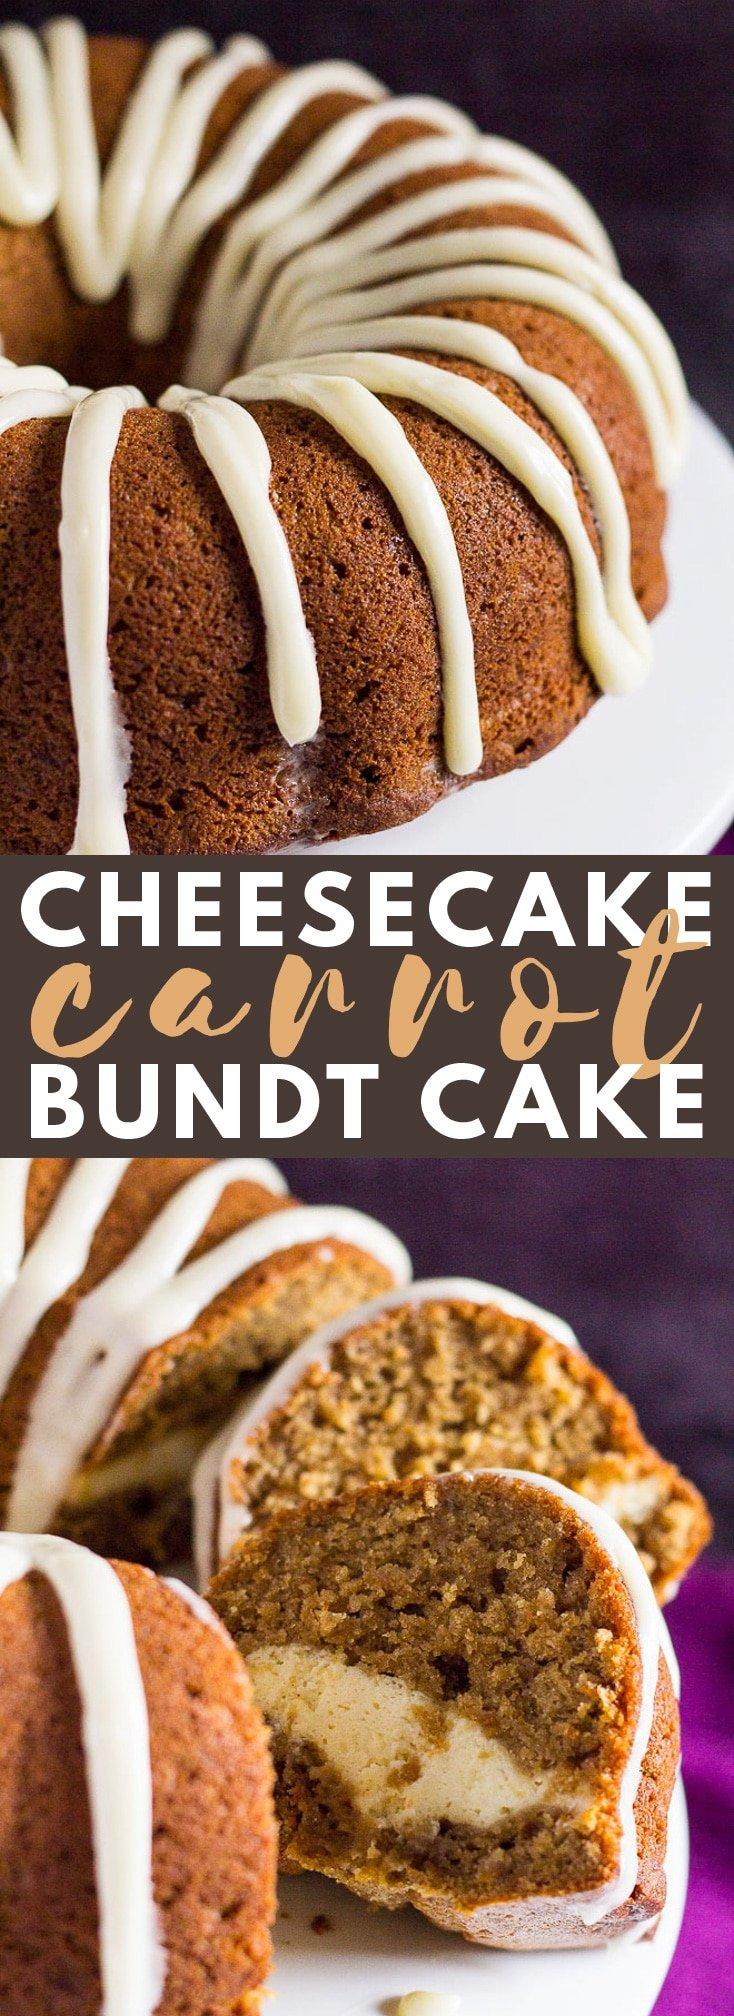 Cheesecake Swirl Carrot Bundt Cake